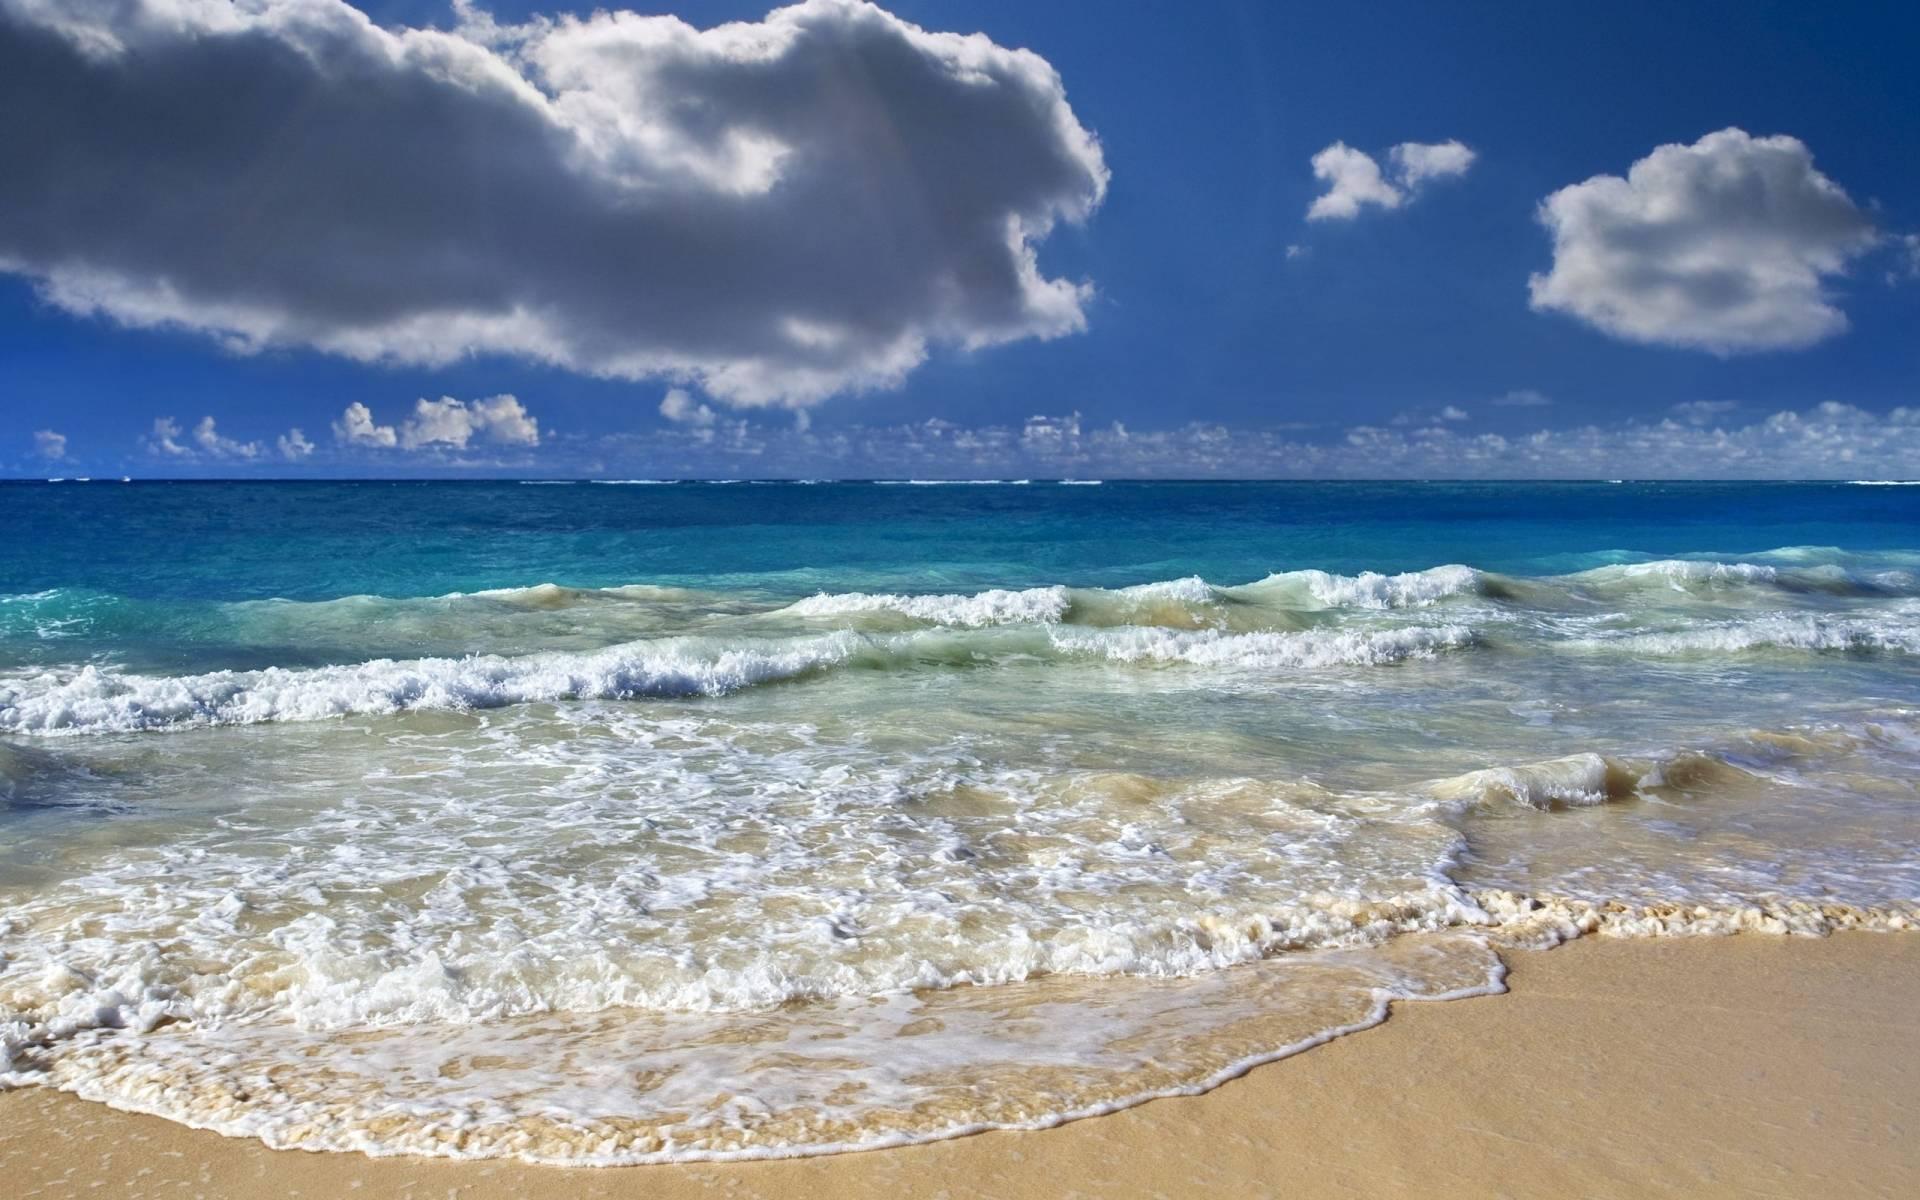 Море океан пляж фото